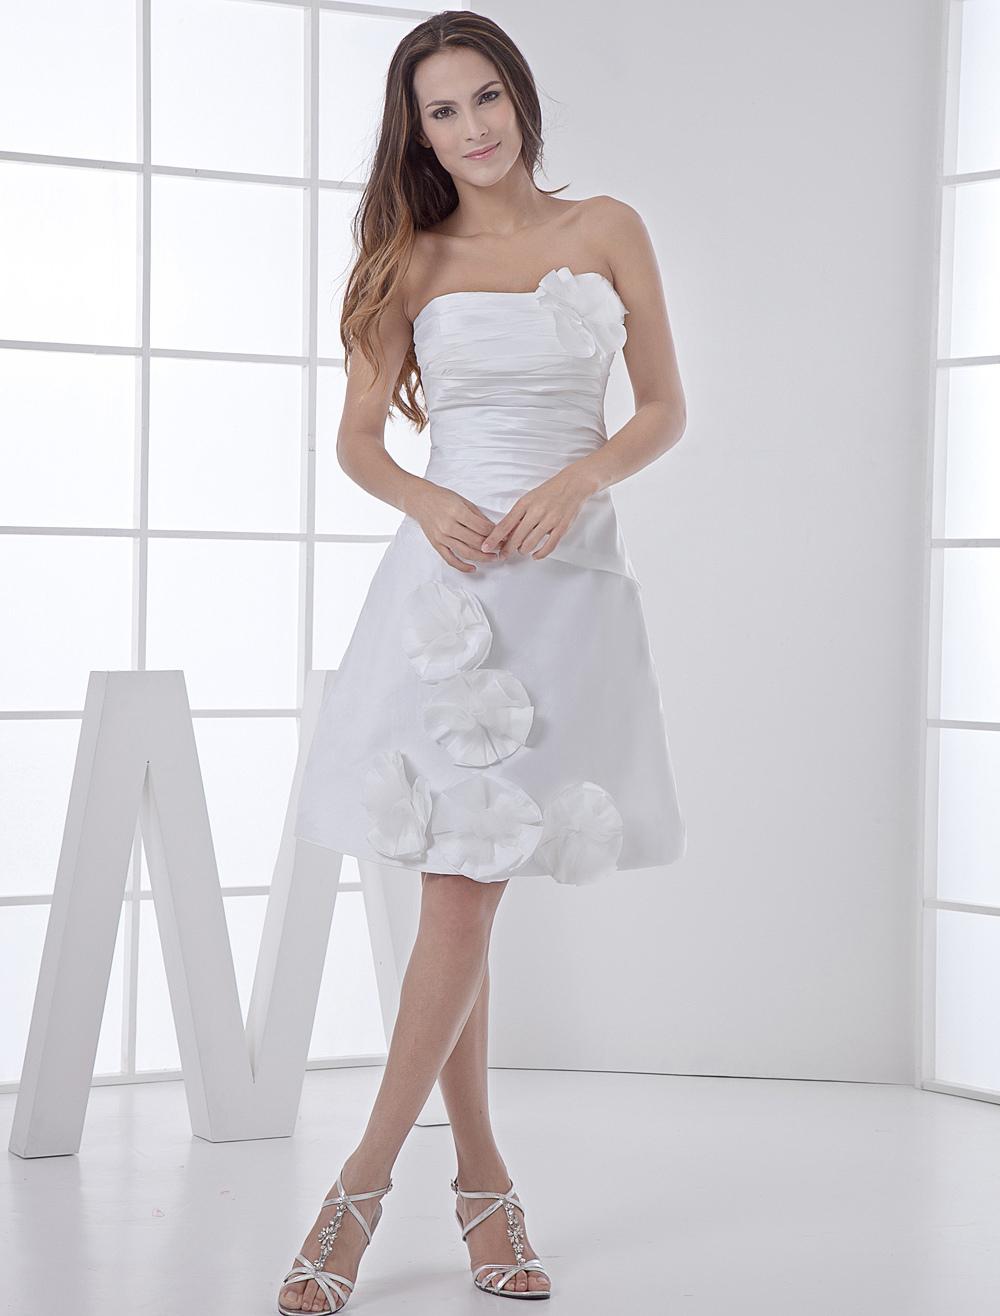 White Wedding Dress Knee Length Strapless Flowers Ruched Taffeta Wedding Gown